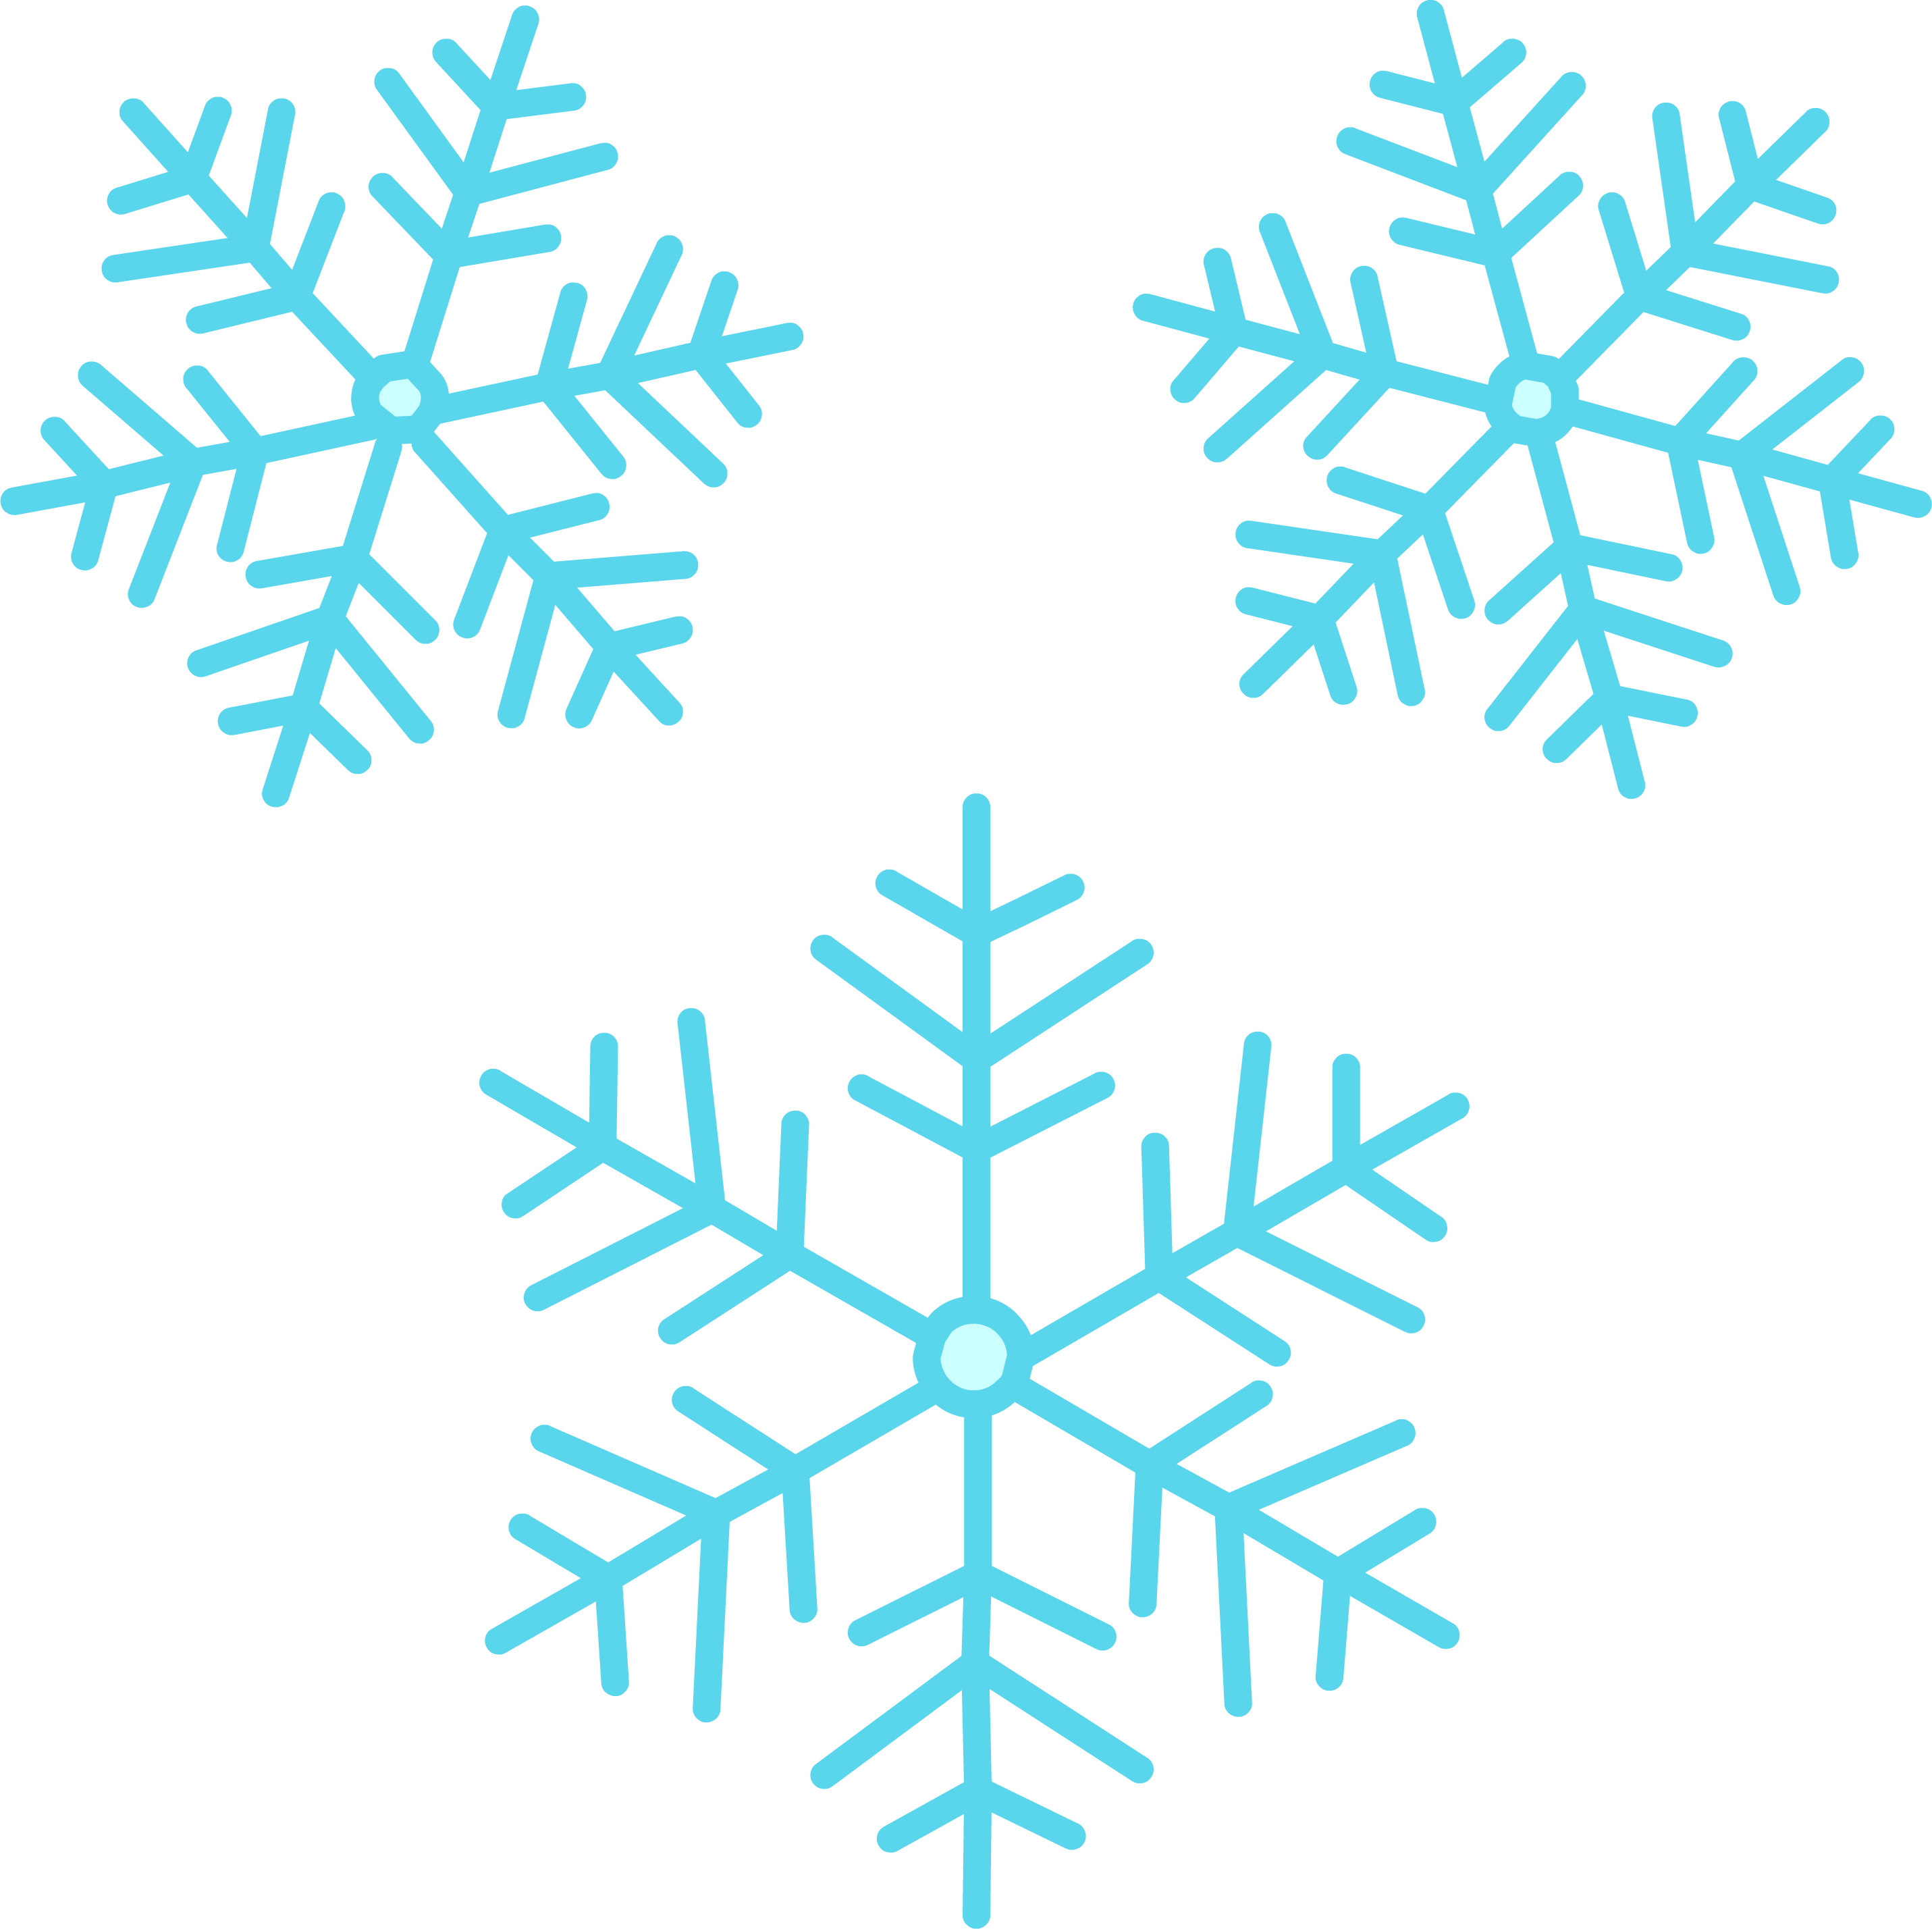 Best Snowflake Png #6972 - Clipartion.com   Blue Snowflakes Png